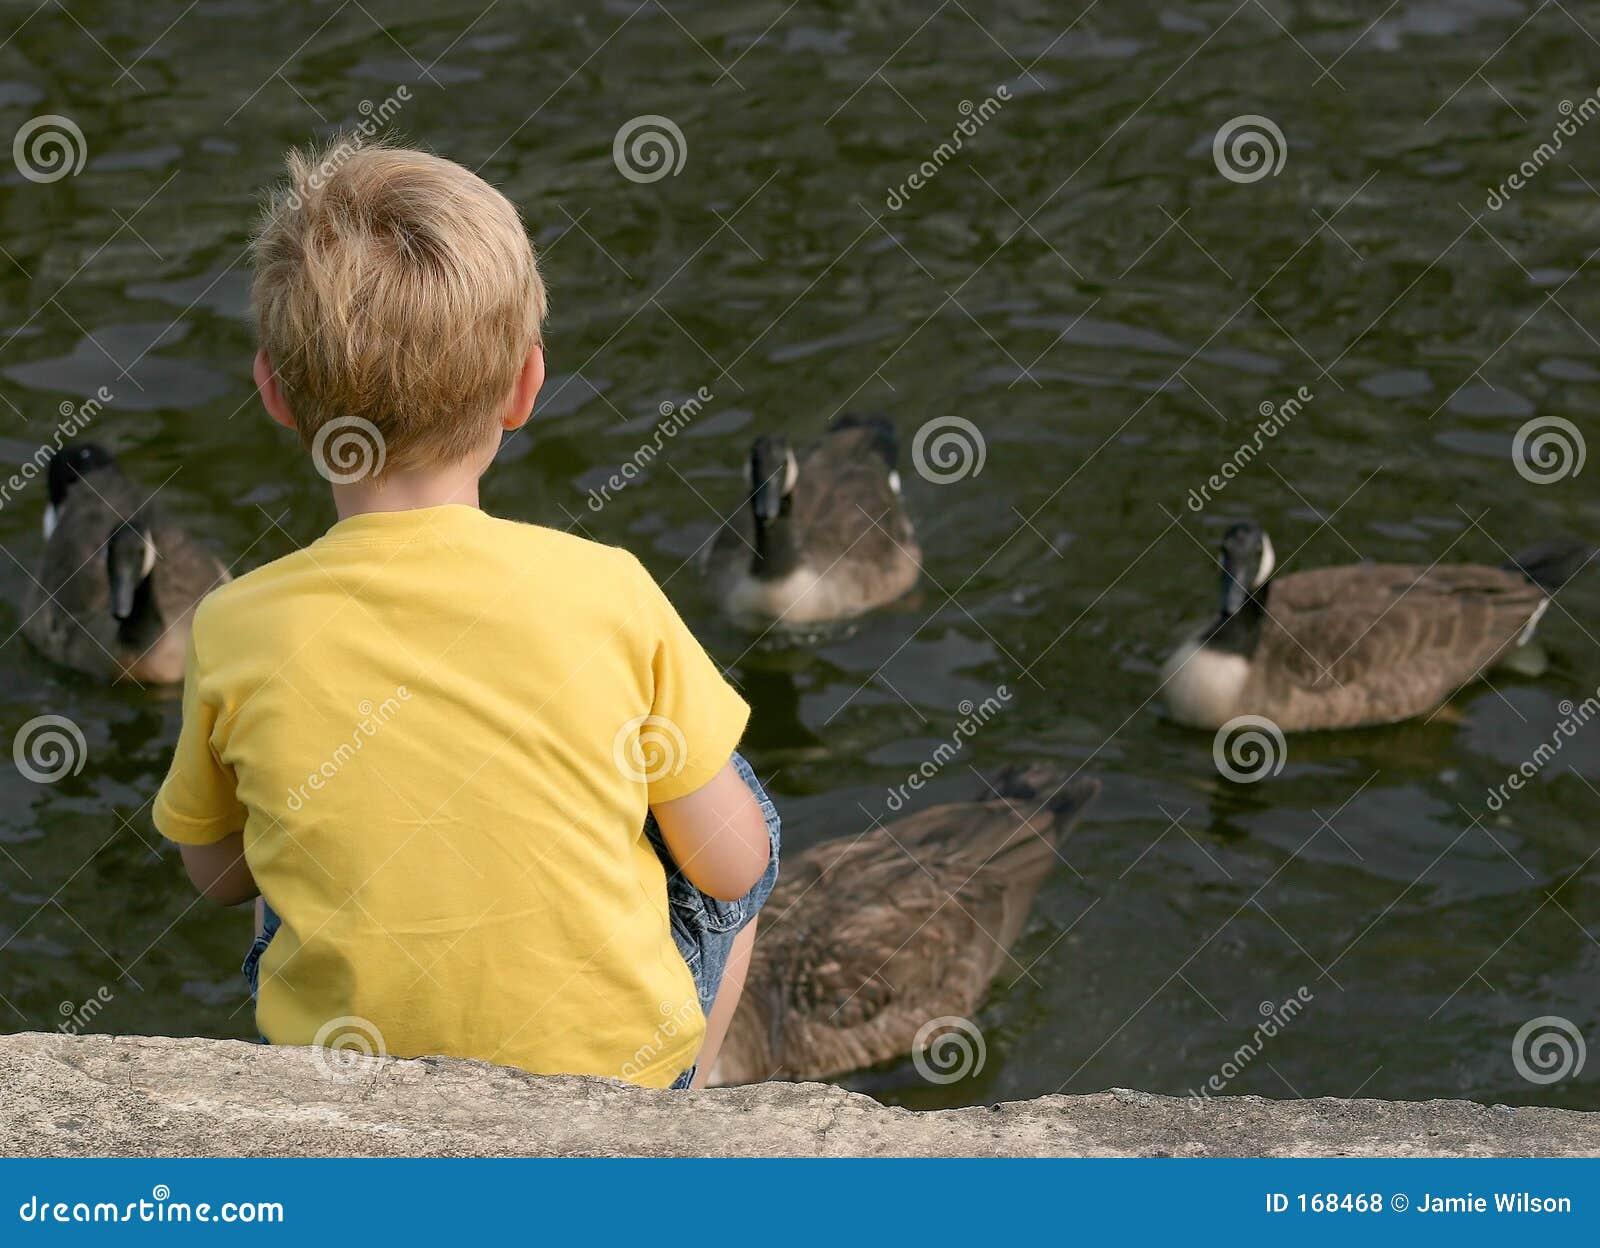 Feeding The Geese